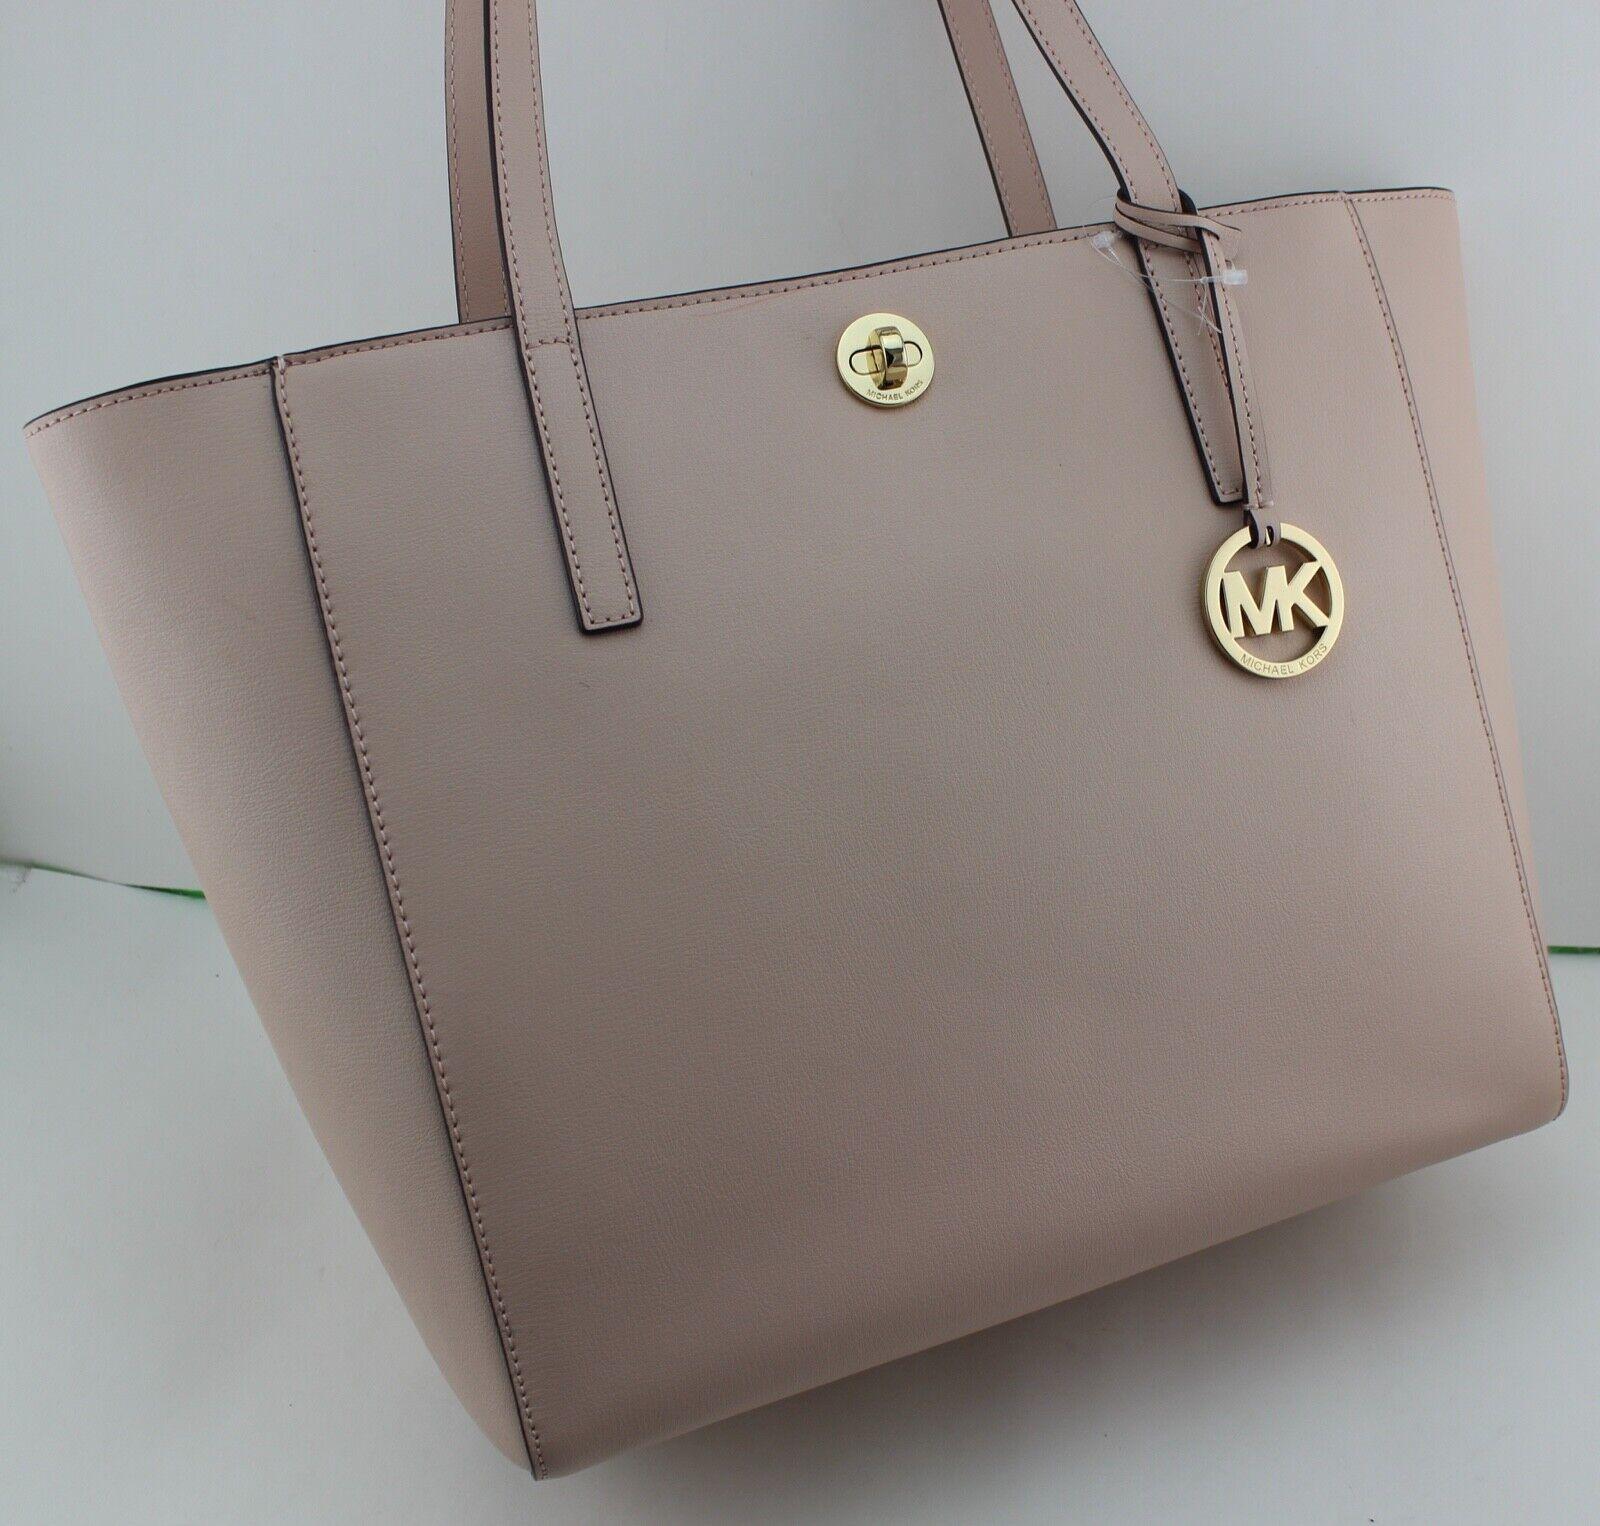 db9a2023ba2a Michael Kors Rivington Large Leather Tote Bag Ballet Pink for sale ...